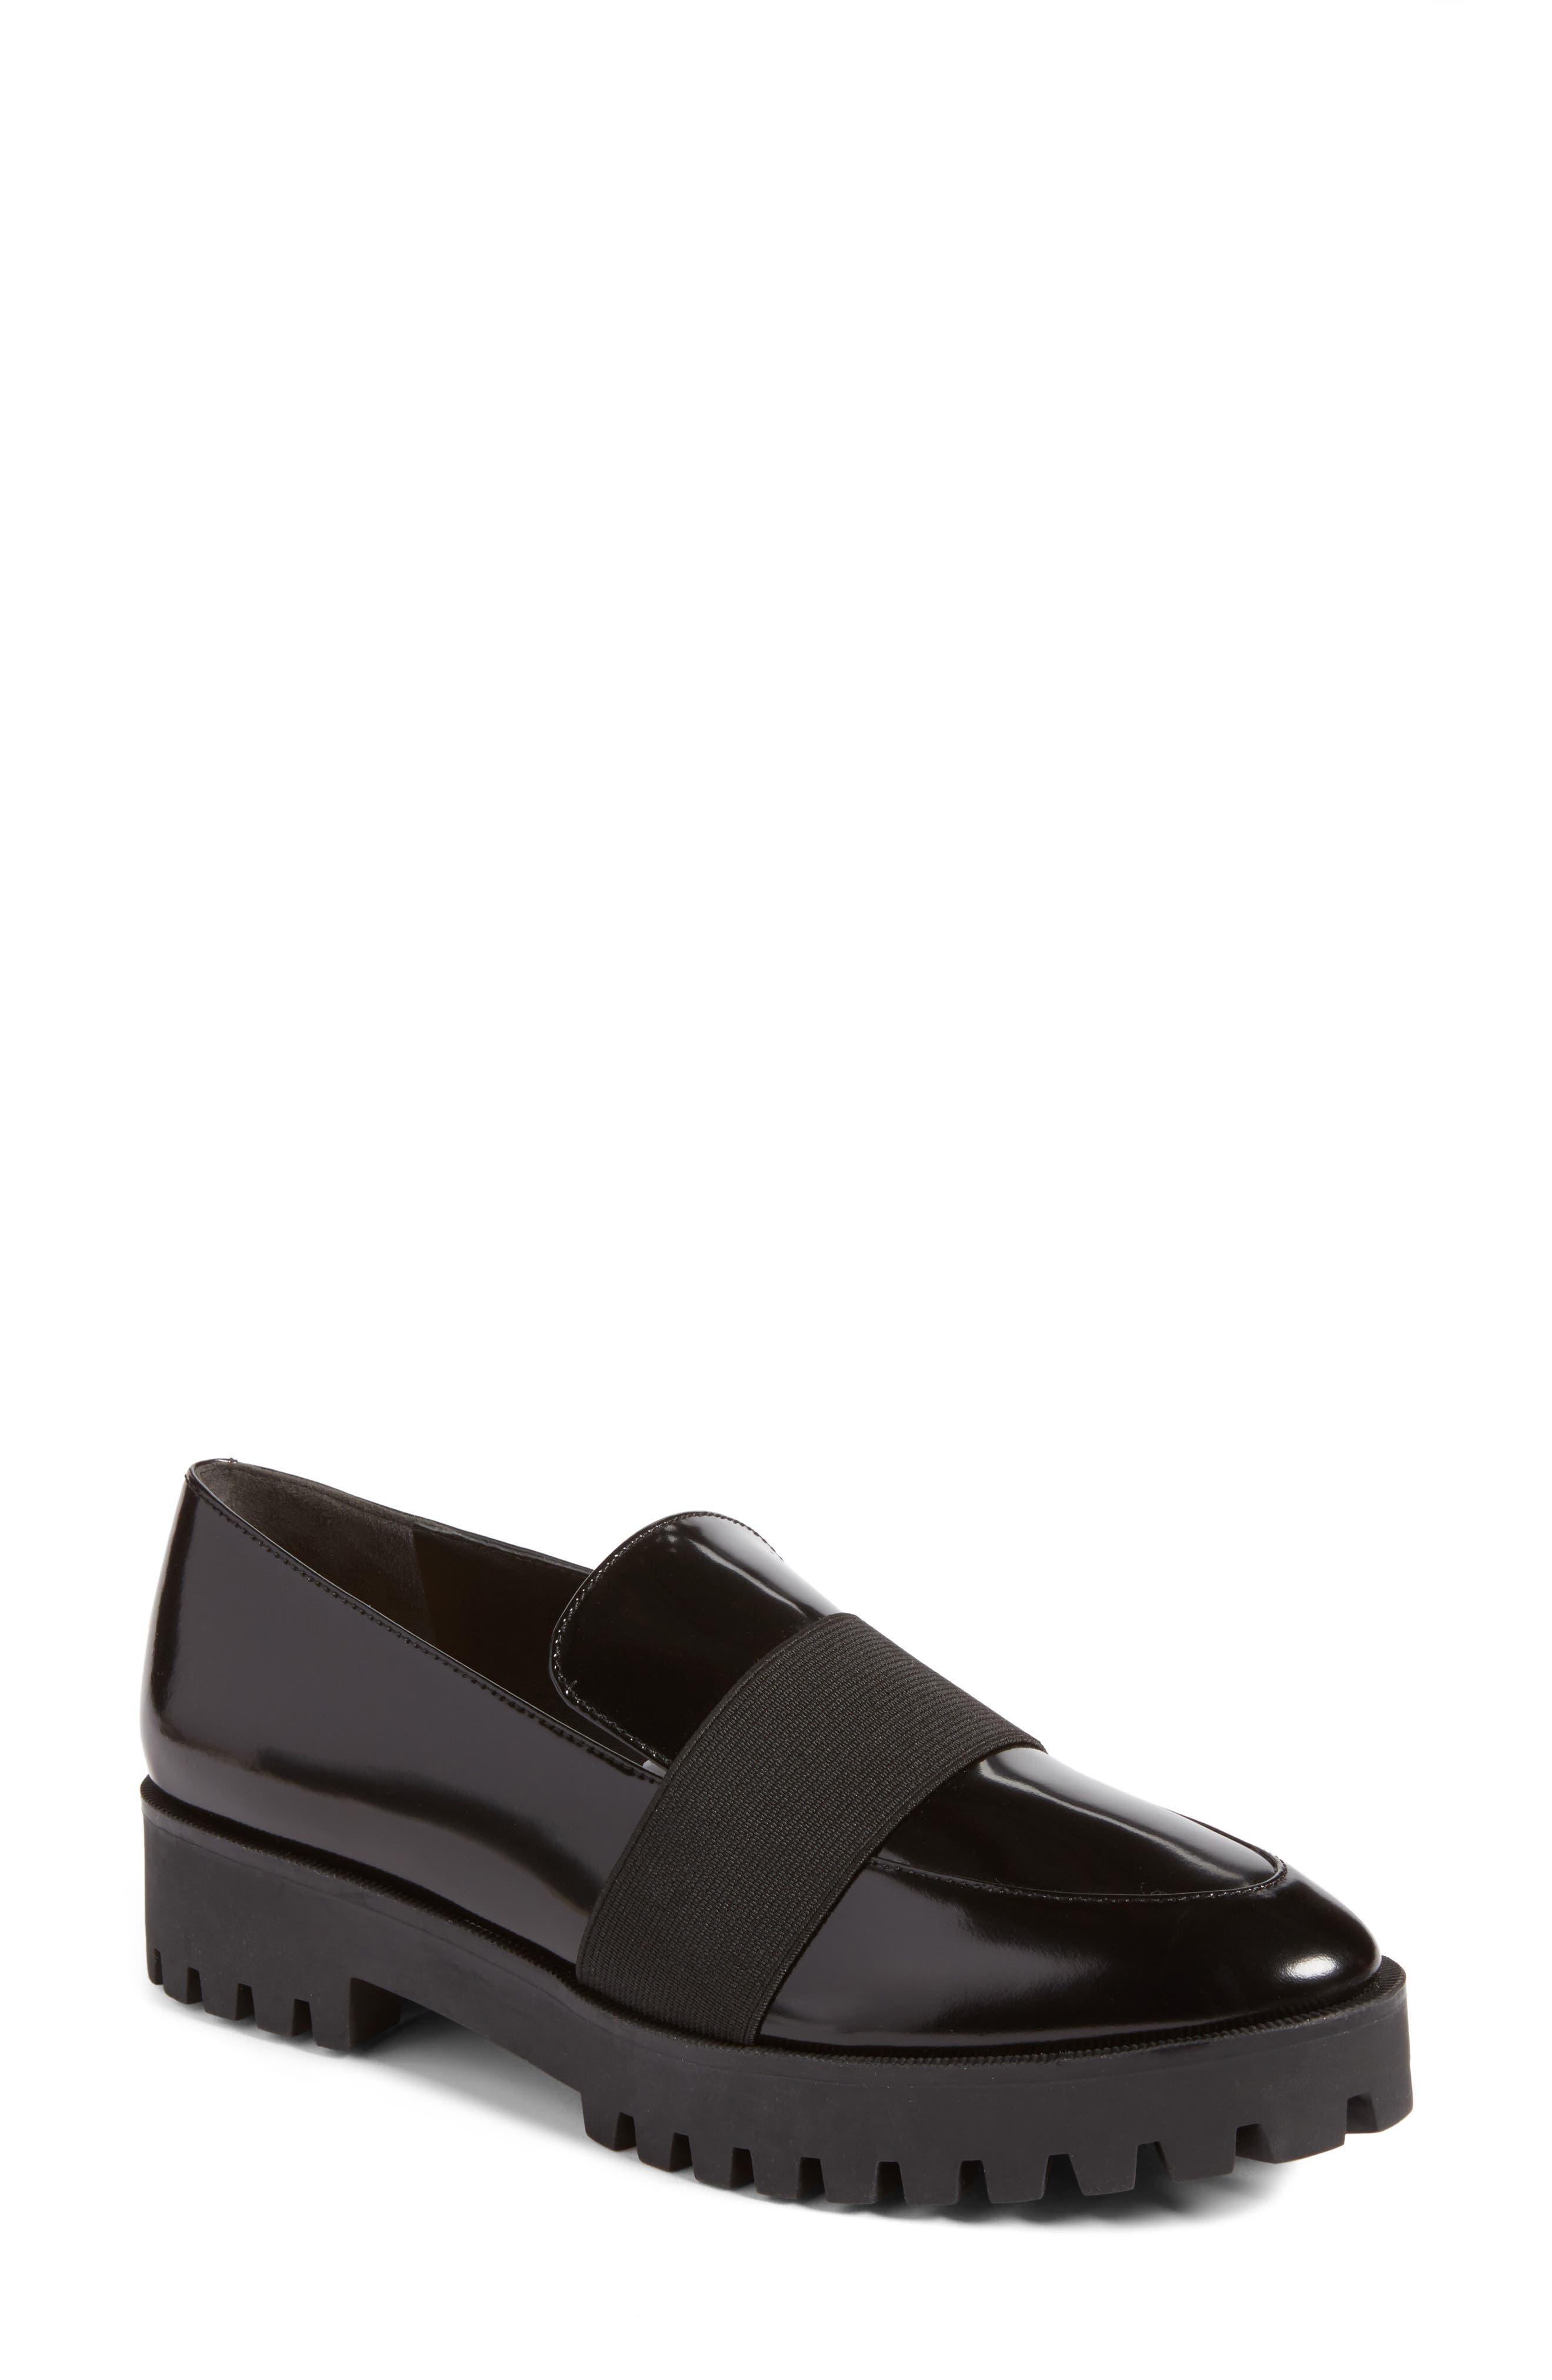 Gallo Platform Loafer,                             Main thumbnail 1, color,                             Black Leather